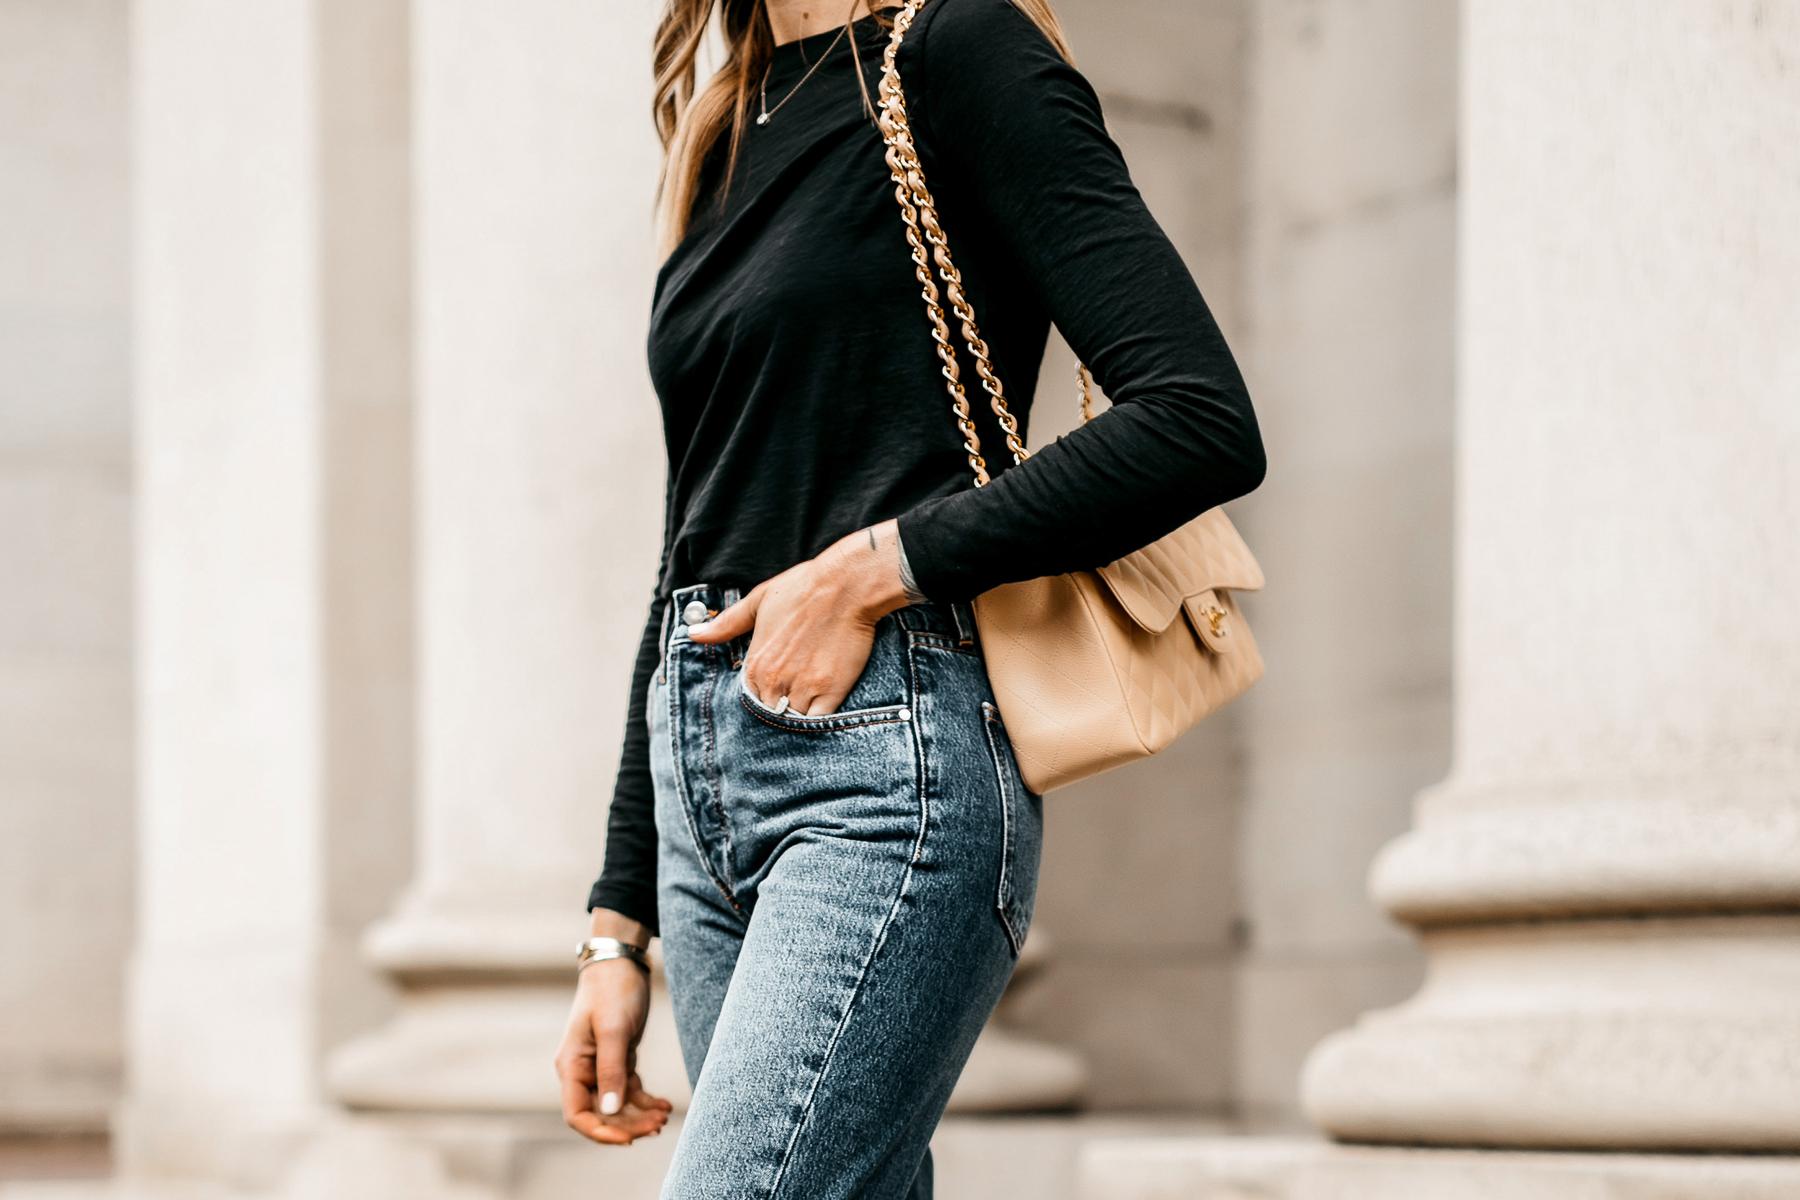 Fashion Jackson Wearing Madewell Black Long Sleeve Tshirt Anine Bing Jeans Beige Chanel Jumbo Handbag